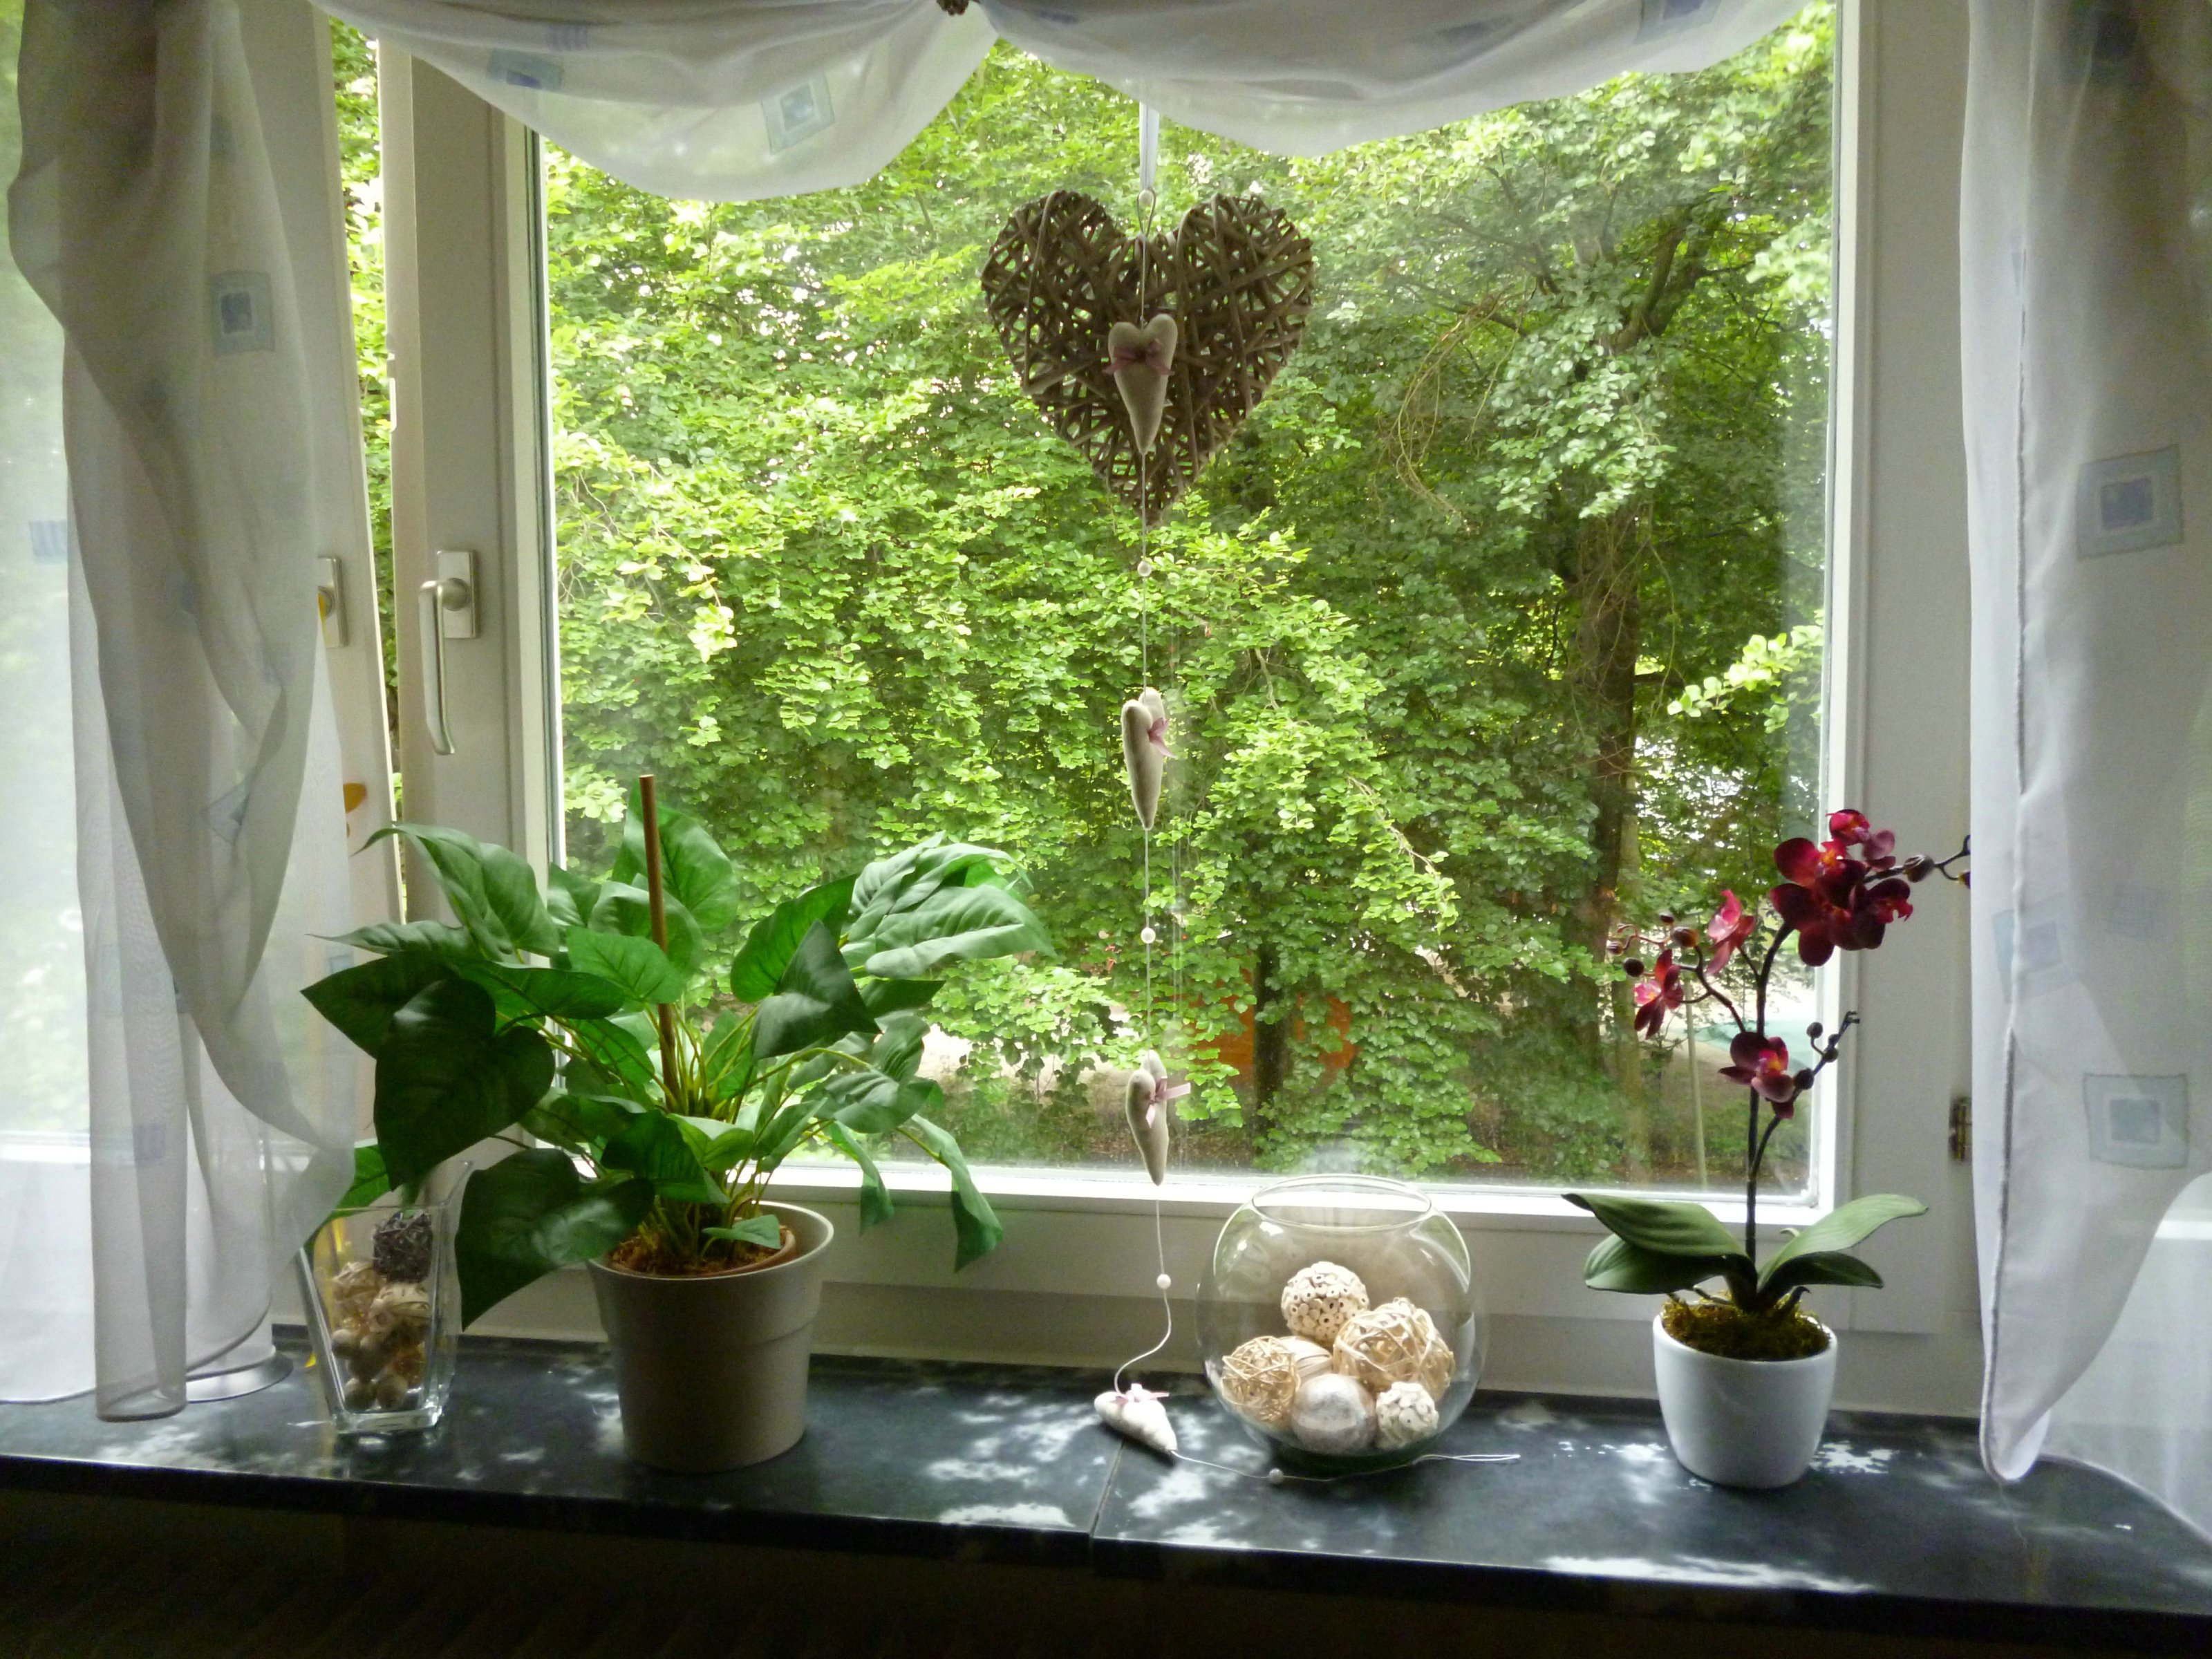 emejing deko fenster wohnzimmer ideas interior design. Black Bedroom Furniture Sets. Home Design Ideas